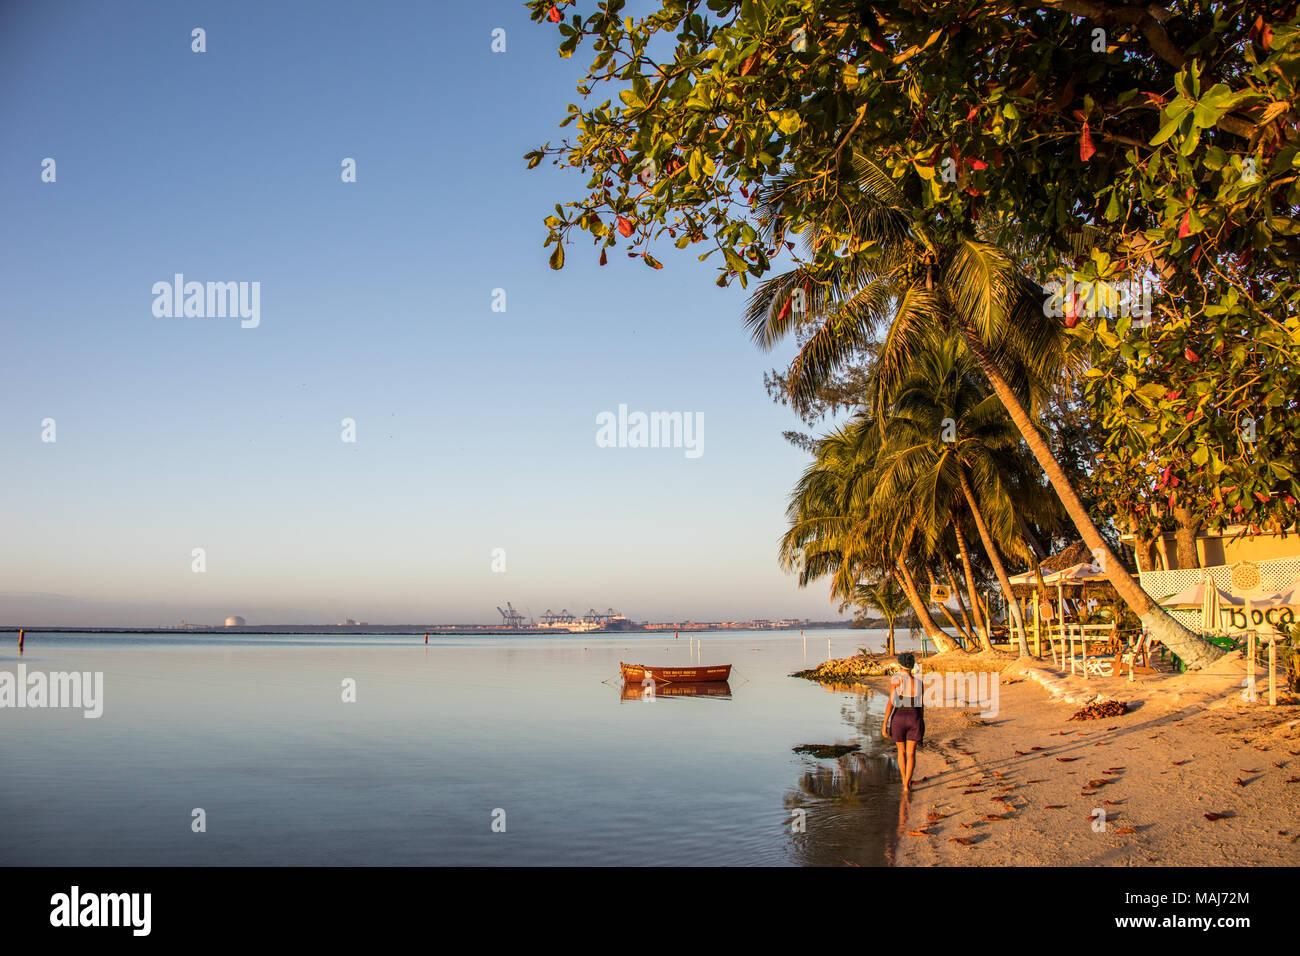 Playa Pública Boca Chica, Boca Chine, République Domnican Photo Stock